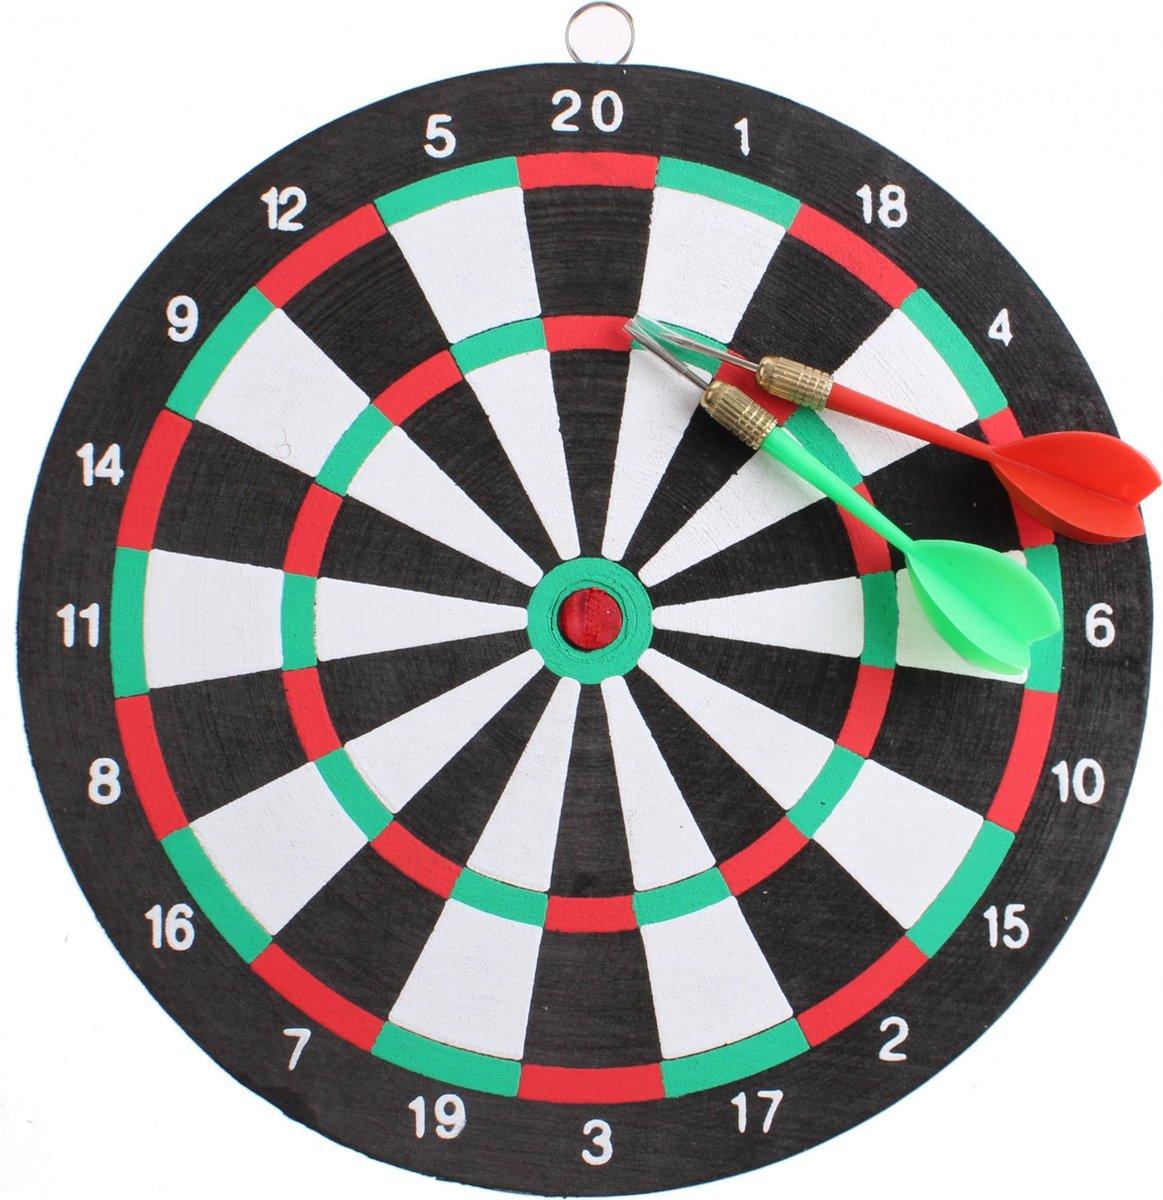 Master Darts Dartbord 24 Cm Met 2 Pijlen